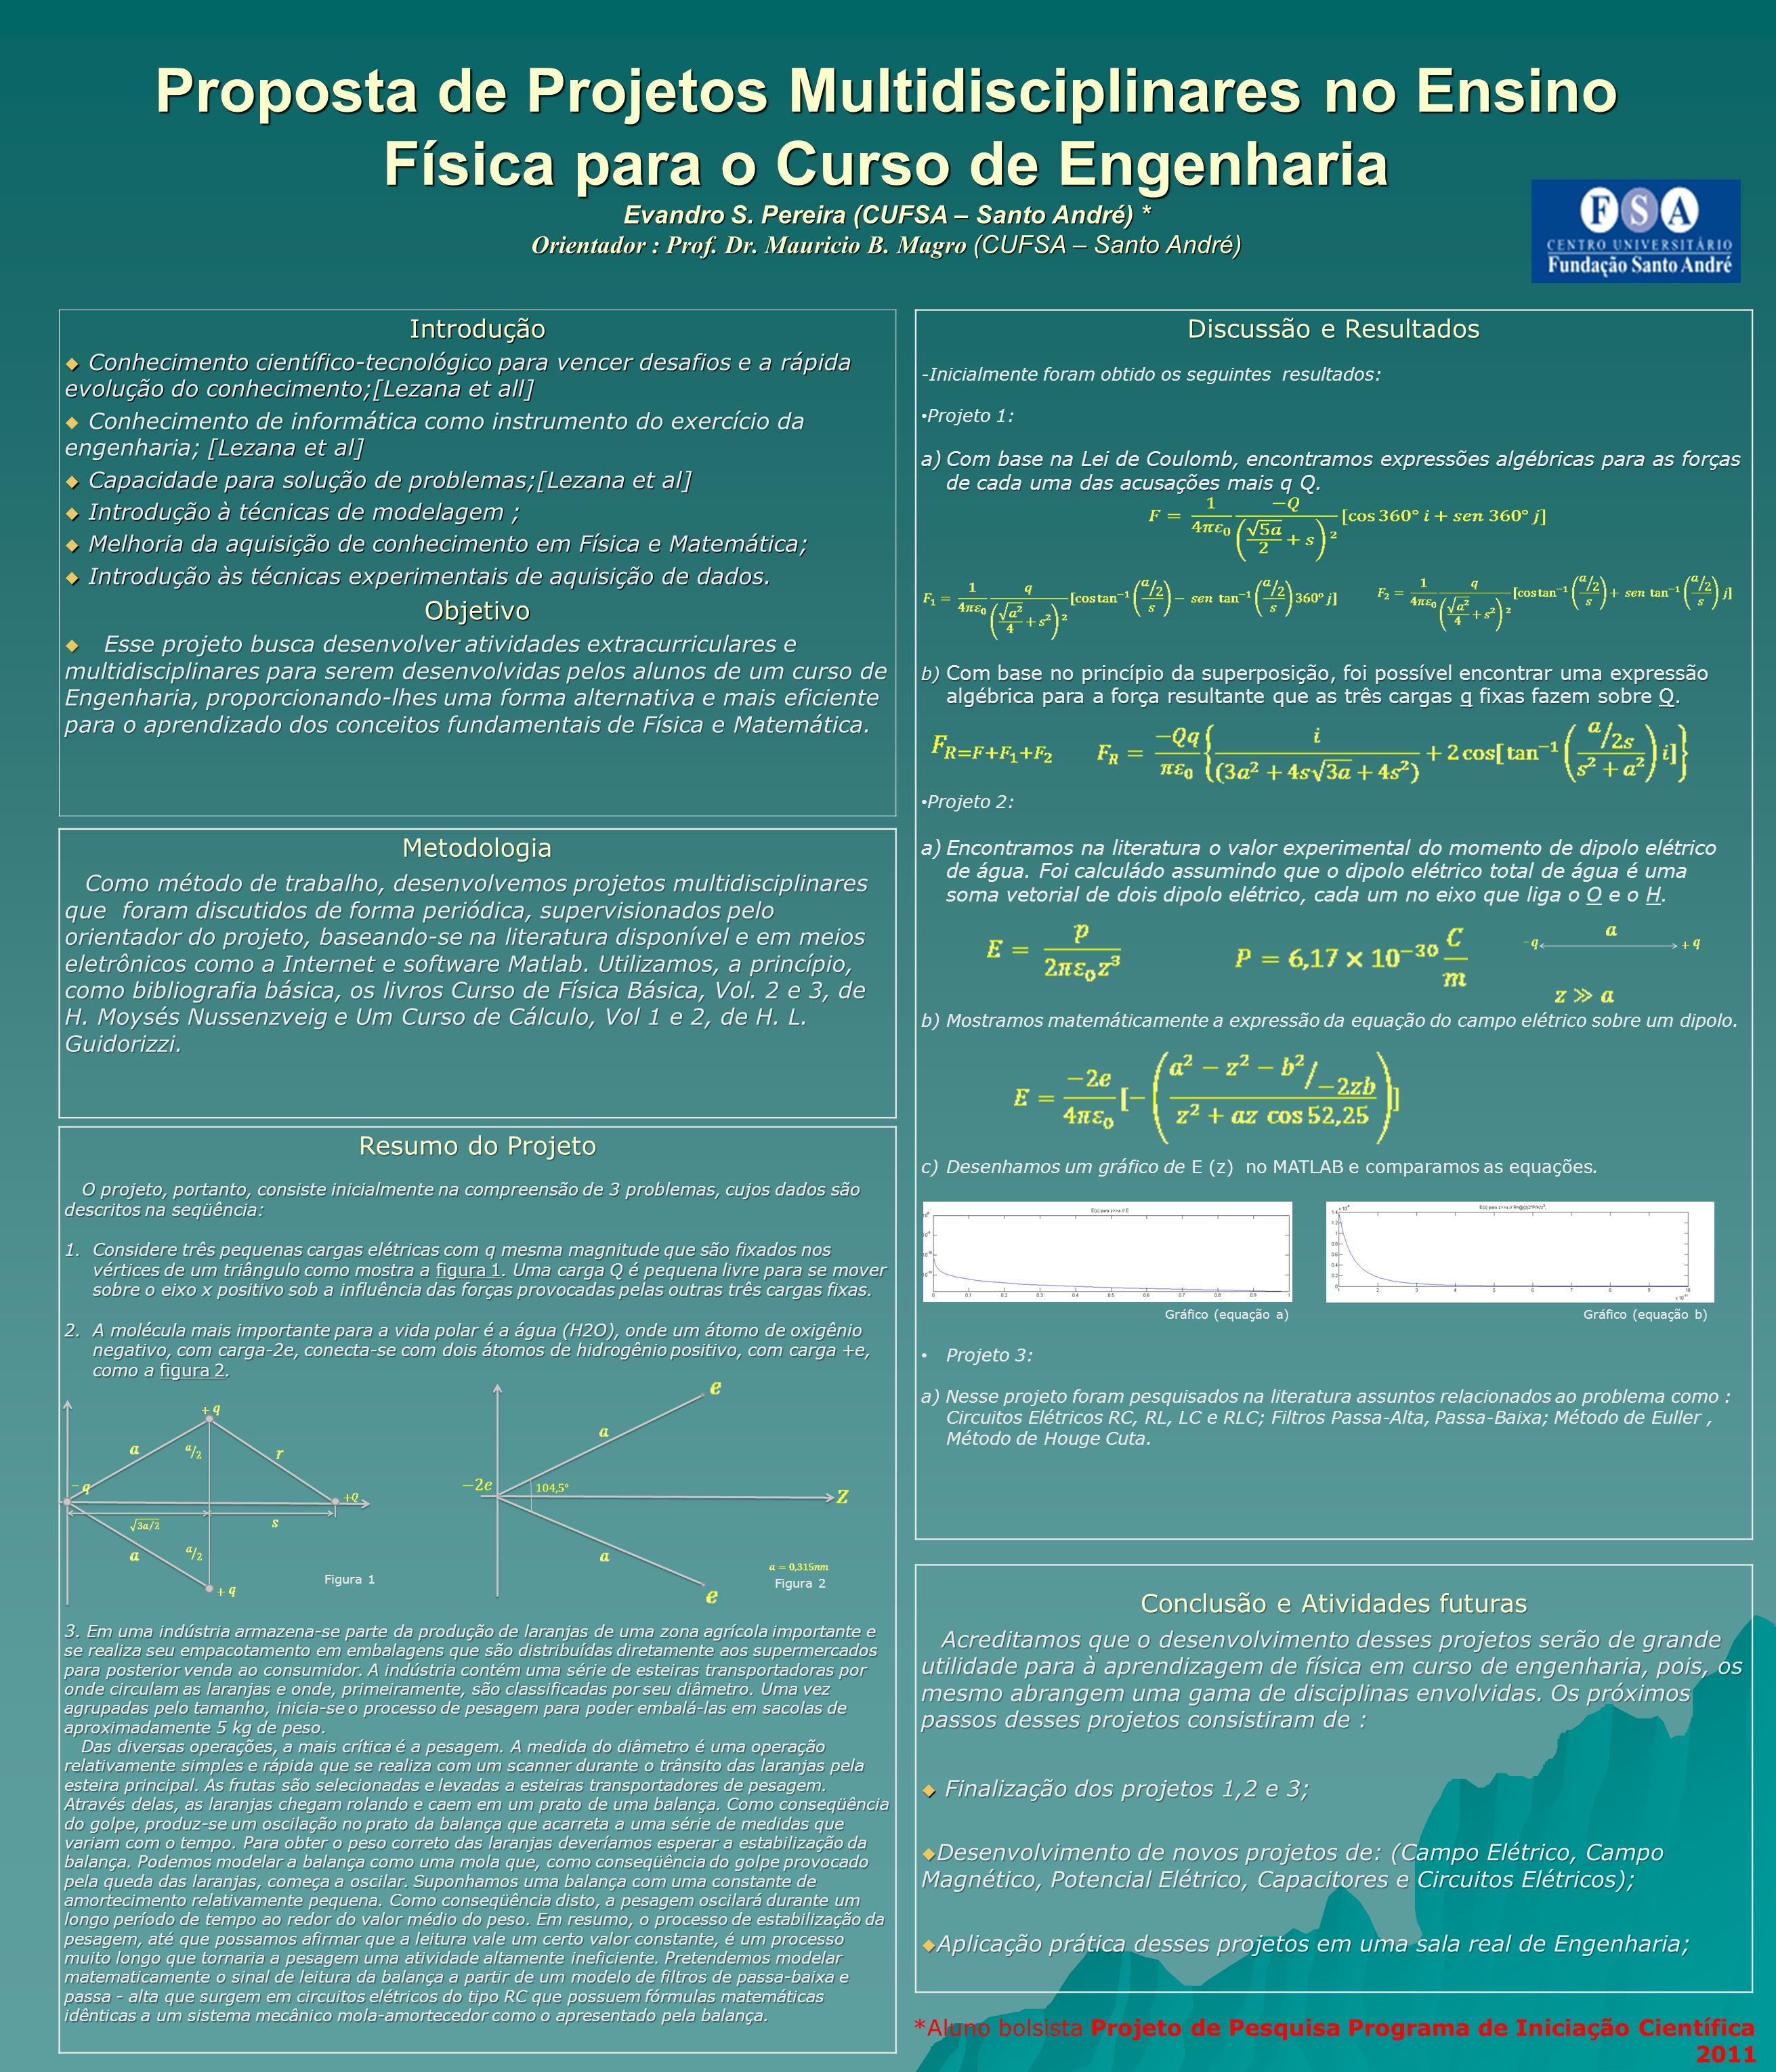 Proposta de Projetos Multidisciplinares no Ensino Física para o Curso de Engenharia Evandro S. Pereira (CUFSA – Santo André) * Orientador : Prof. Dr. Mauricio B. Magro (CUFSA – Santo André)